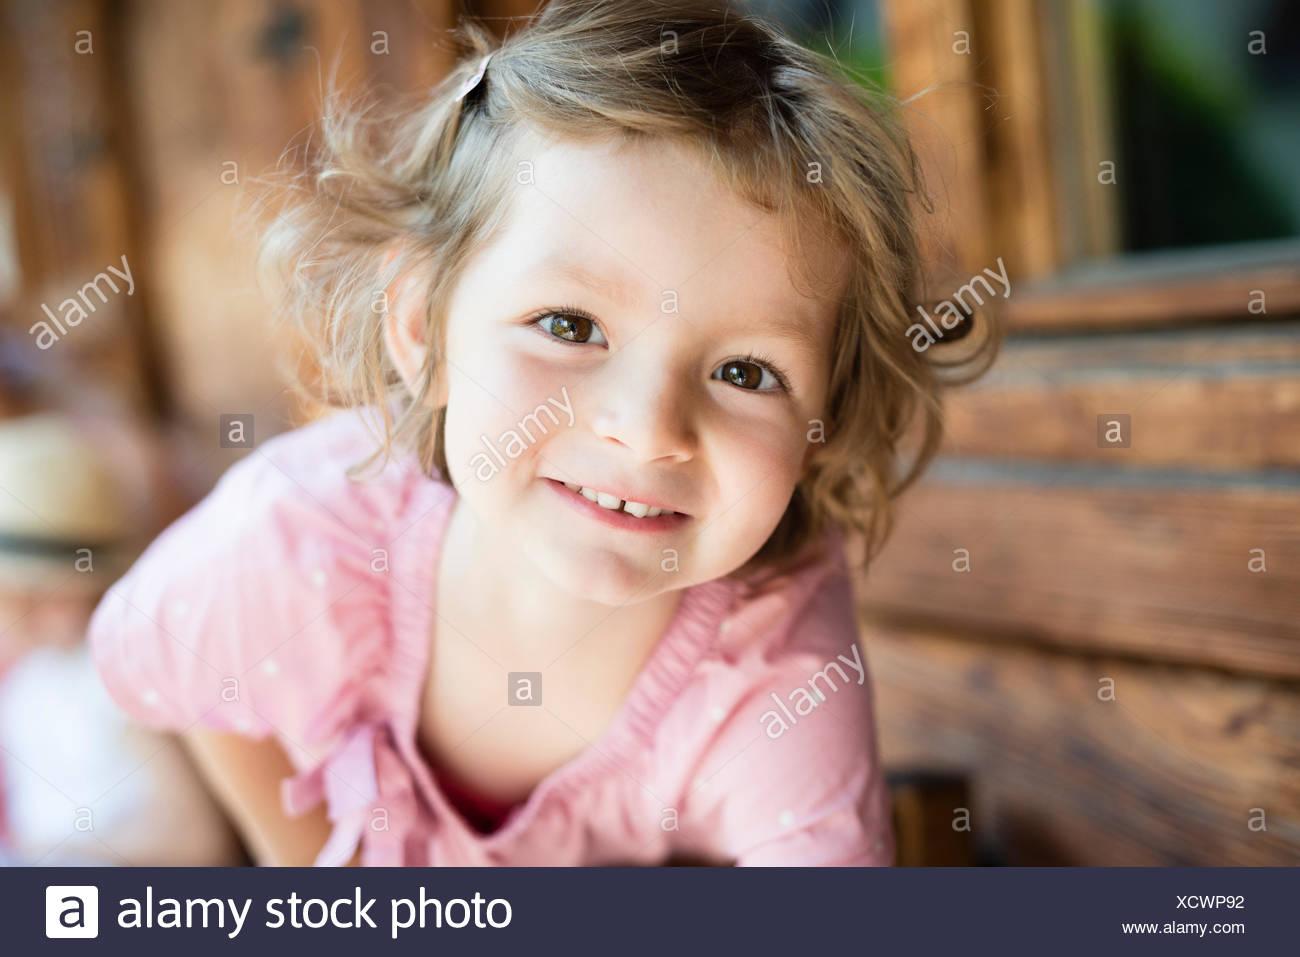 Retrato de niña con el pelo rubio Foto de stock